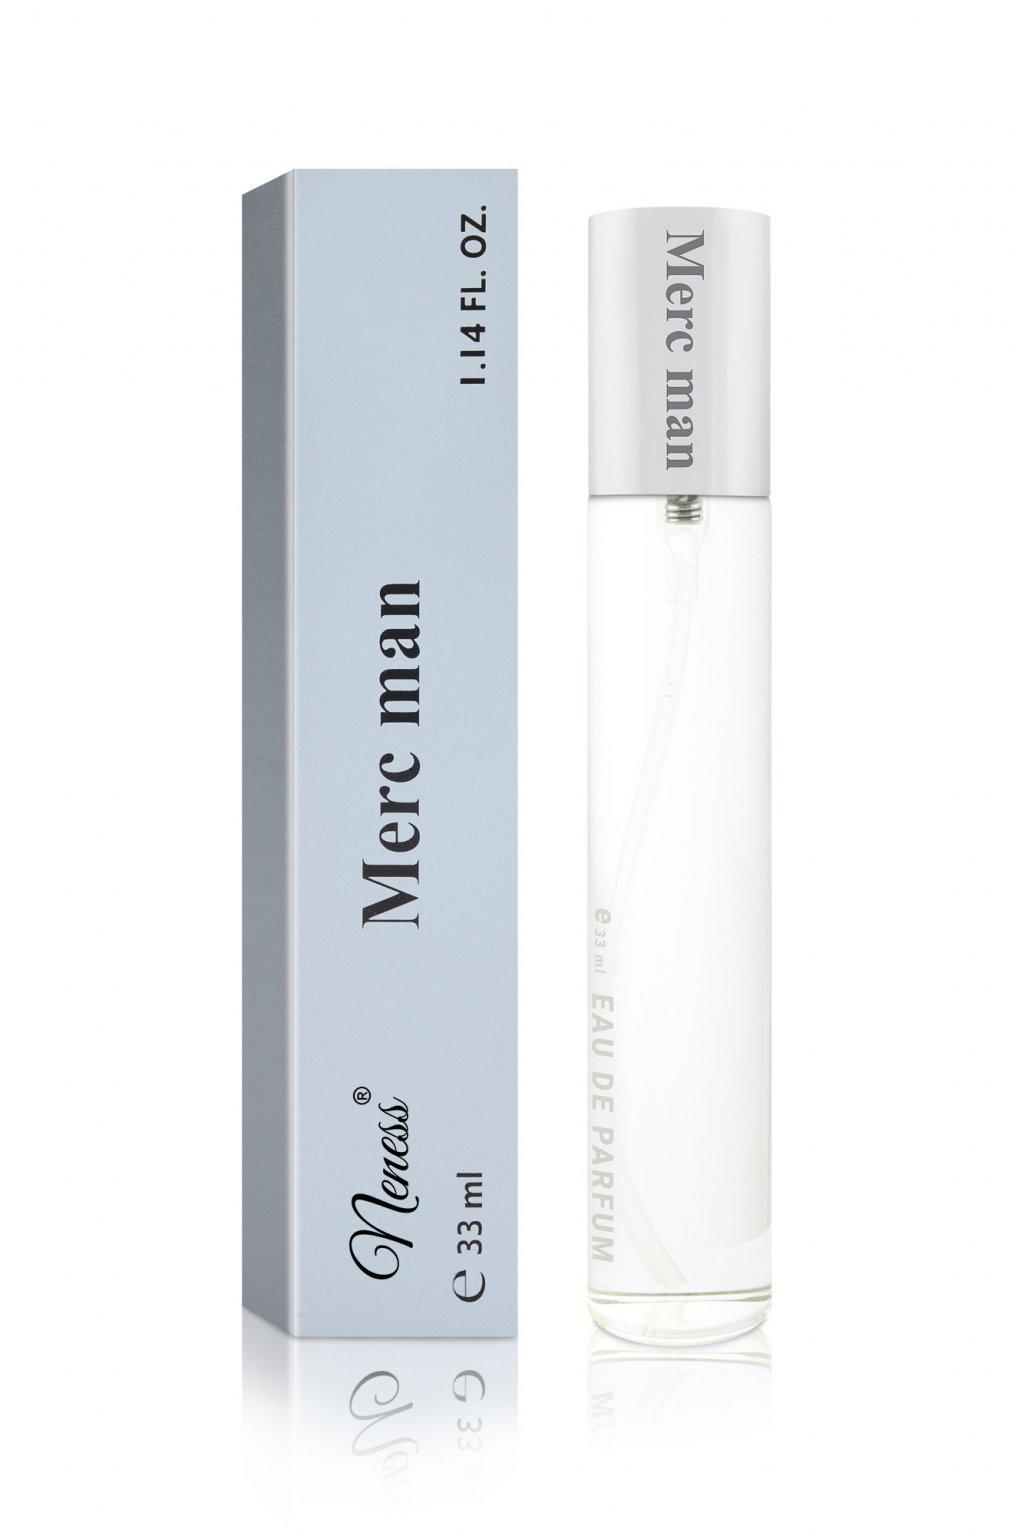 N166 merc man parfemovana voda pro muze 33 ml